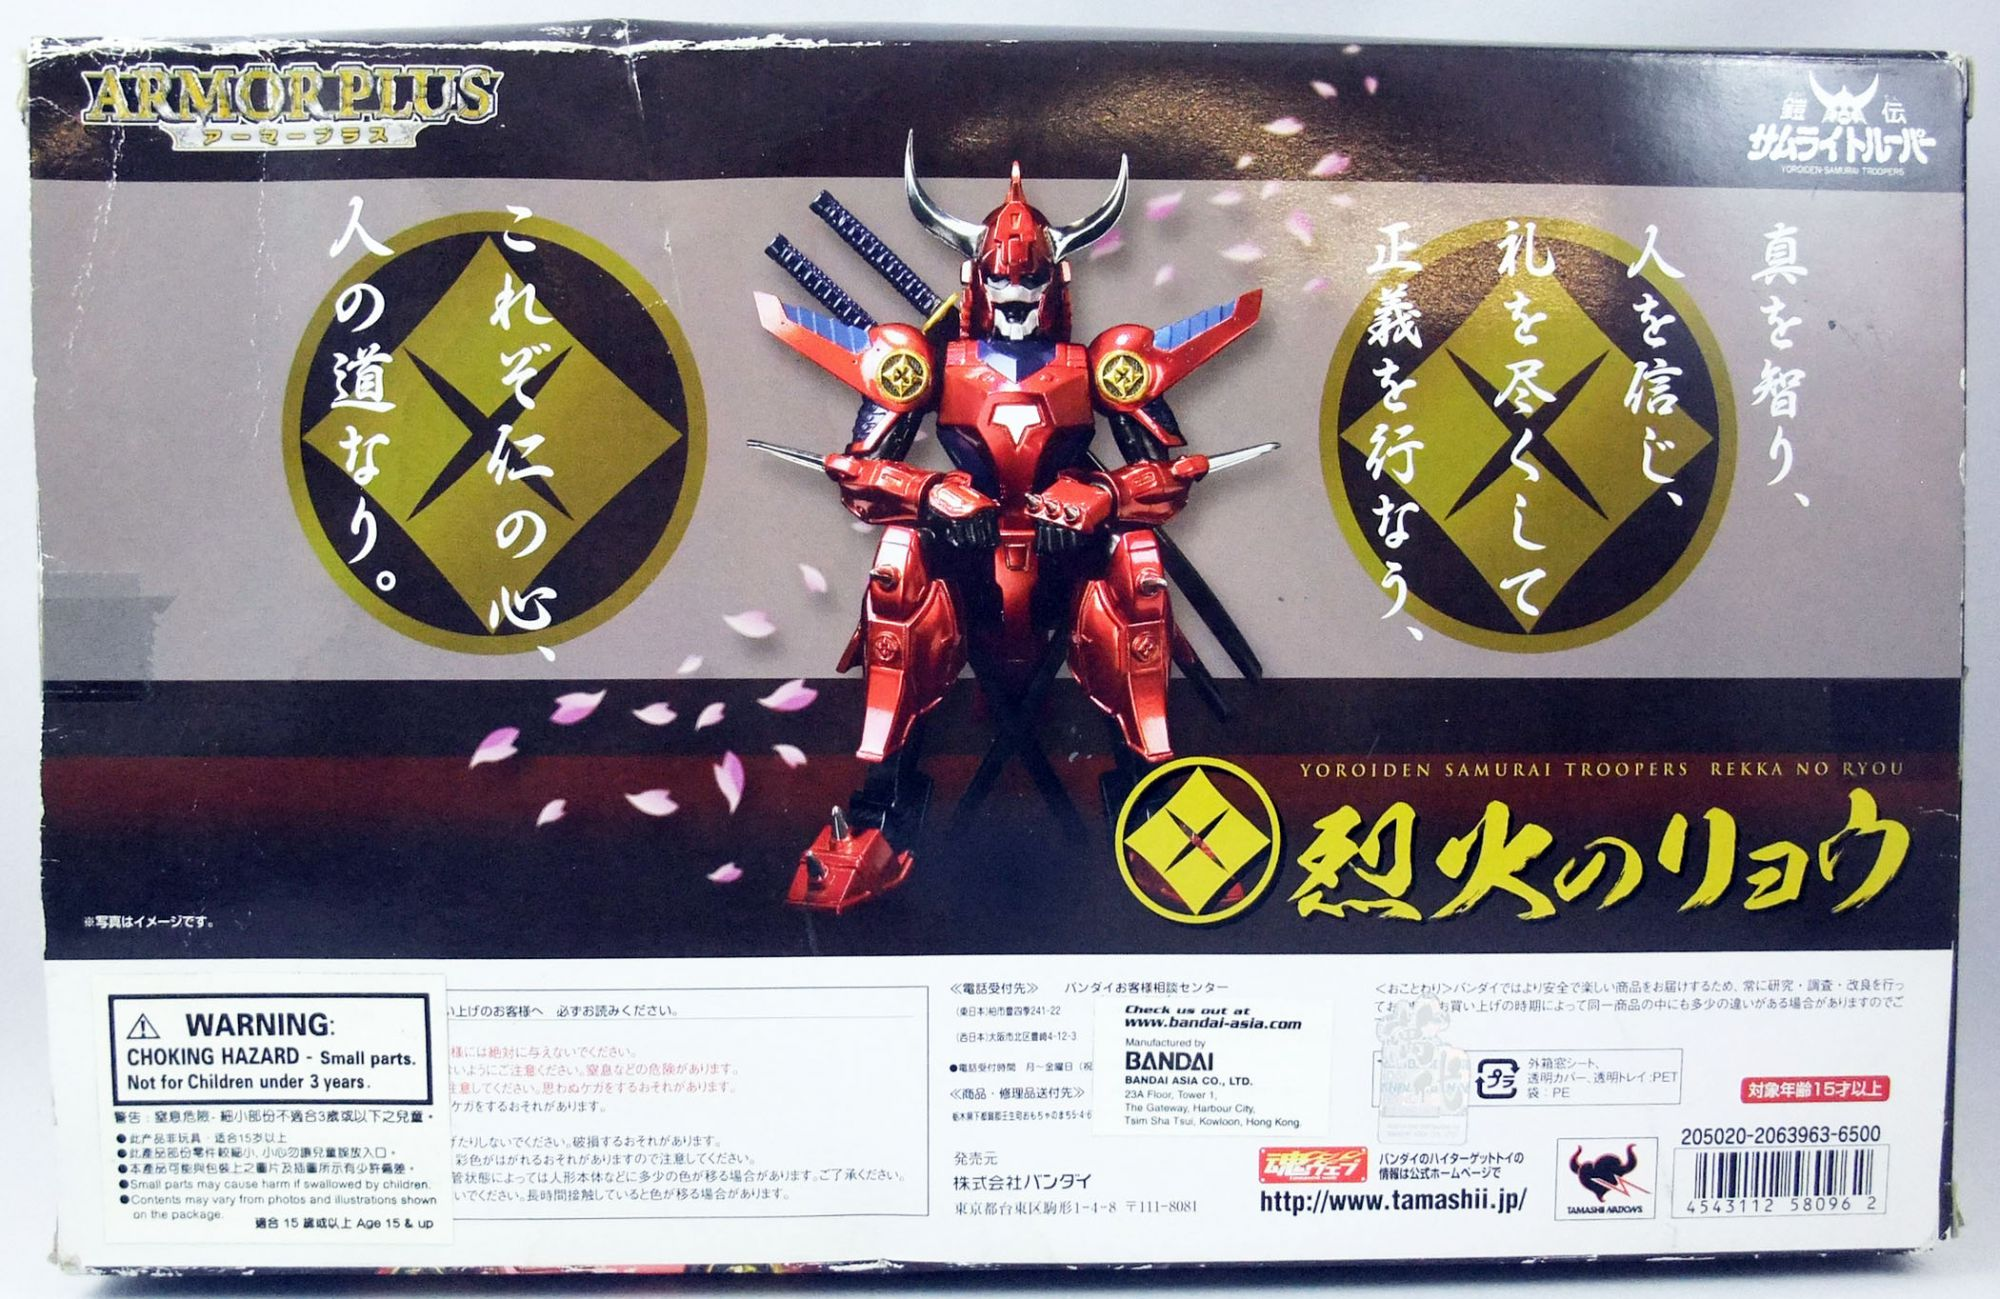 Yoroiden Samurai Troopers - Bandai Armor Plus - Ryo : Samouraï de l\'Eternel du Feu (first edition)